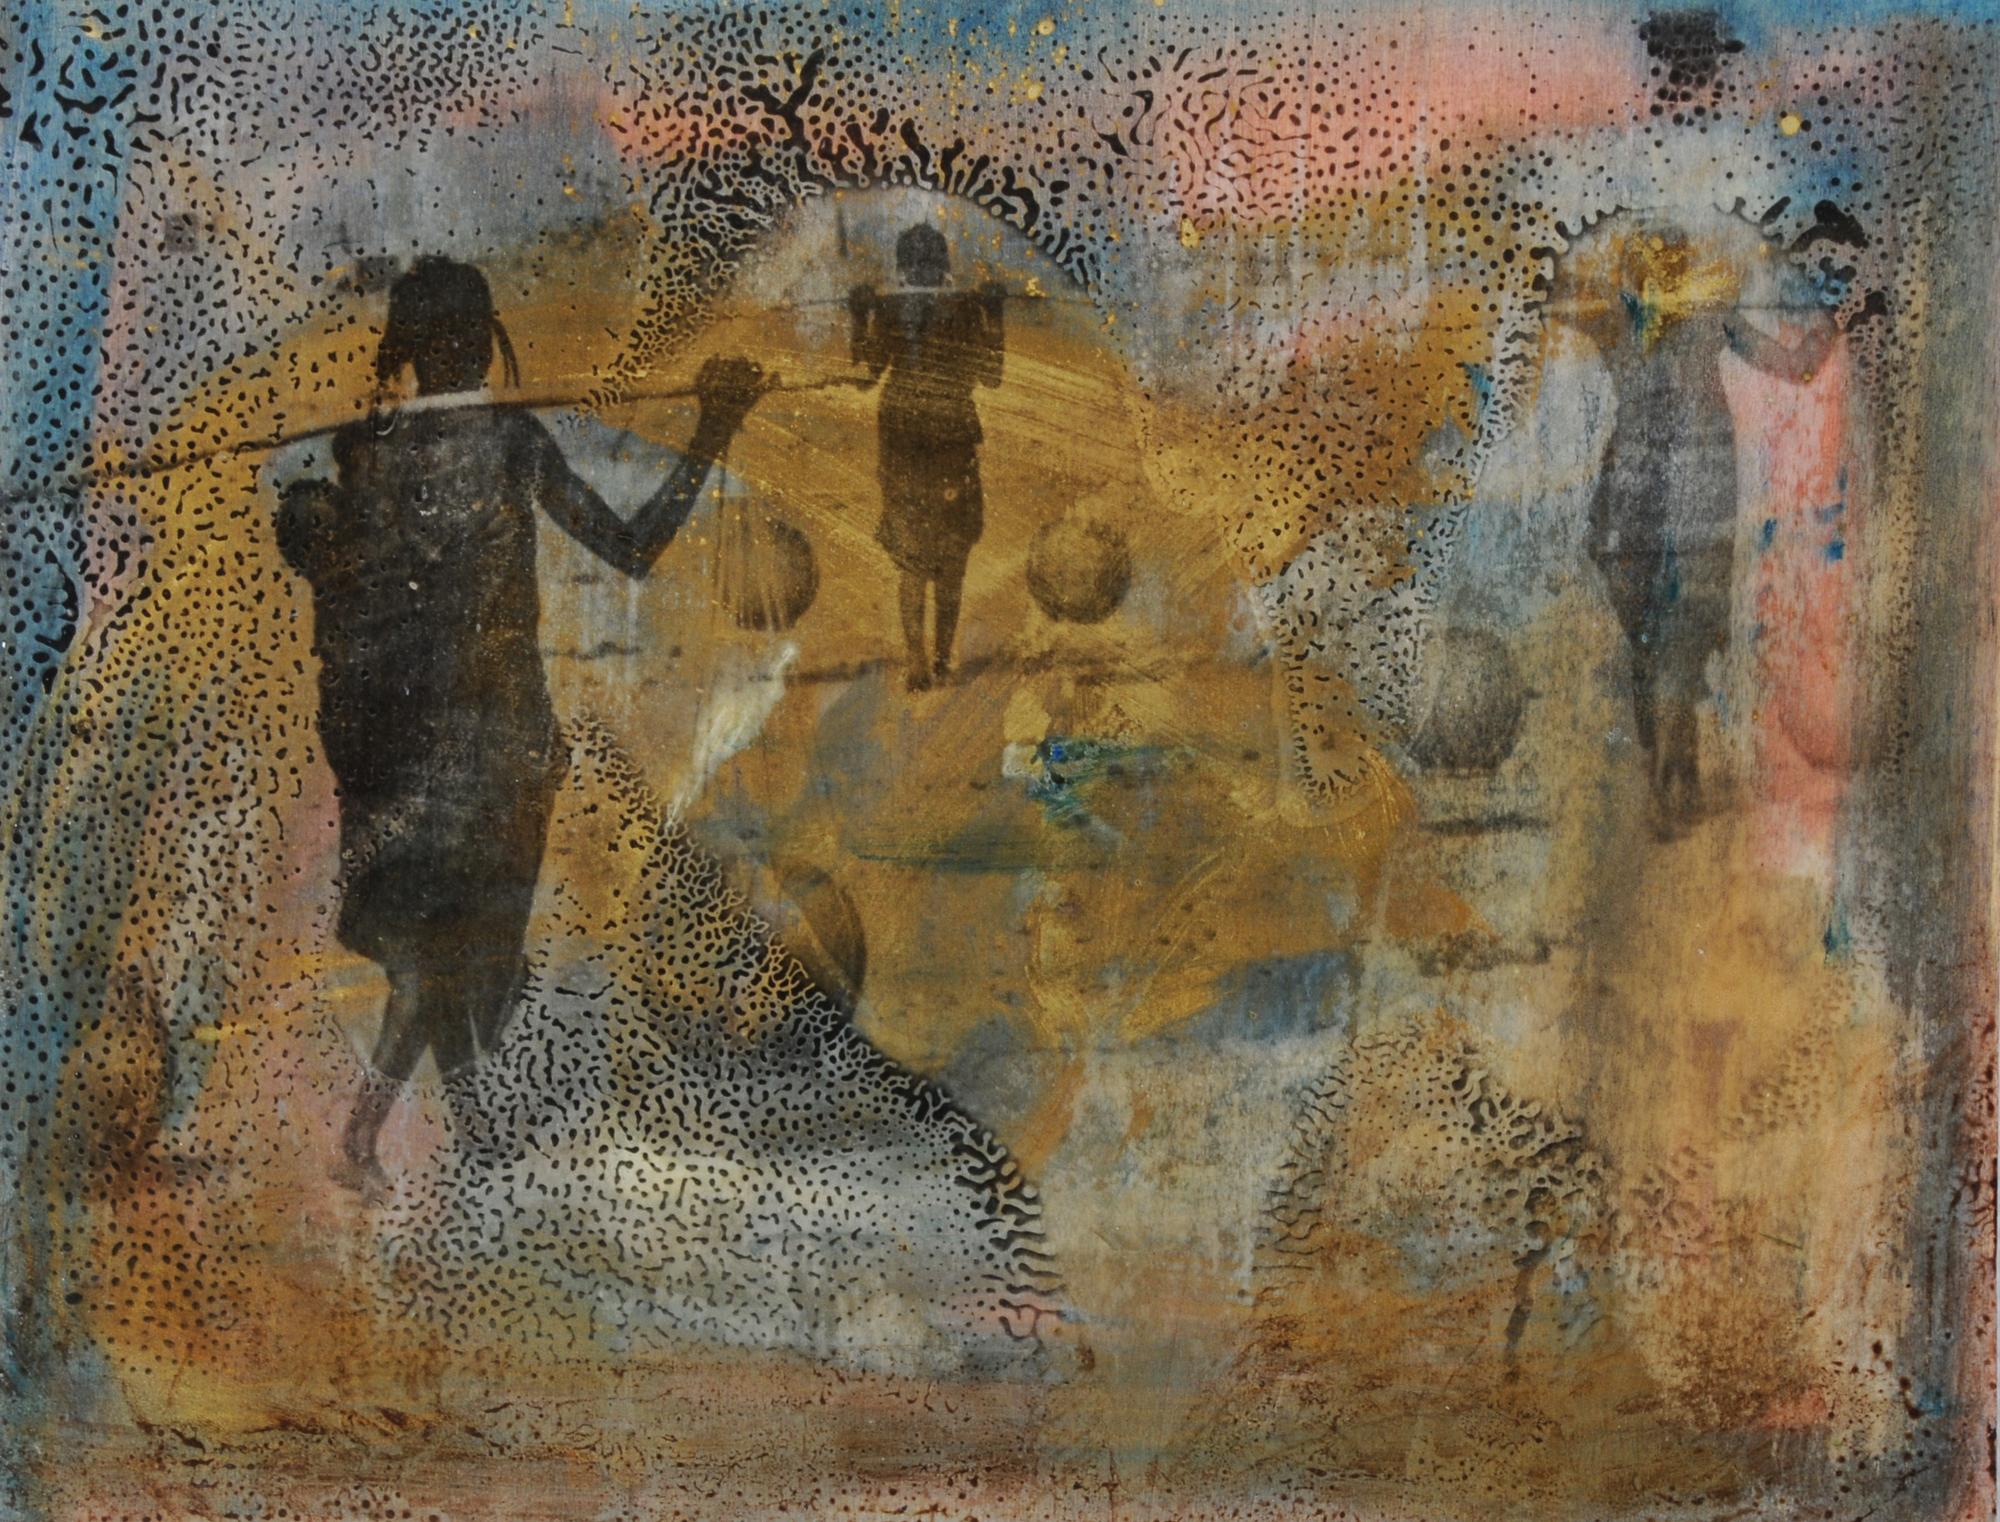 Züst Andreas, Wasserträgerinnen, West-Afrika, approx. 1960